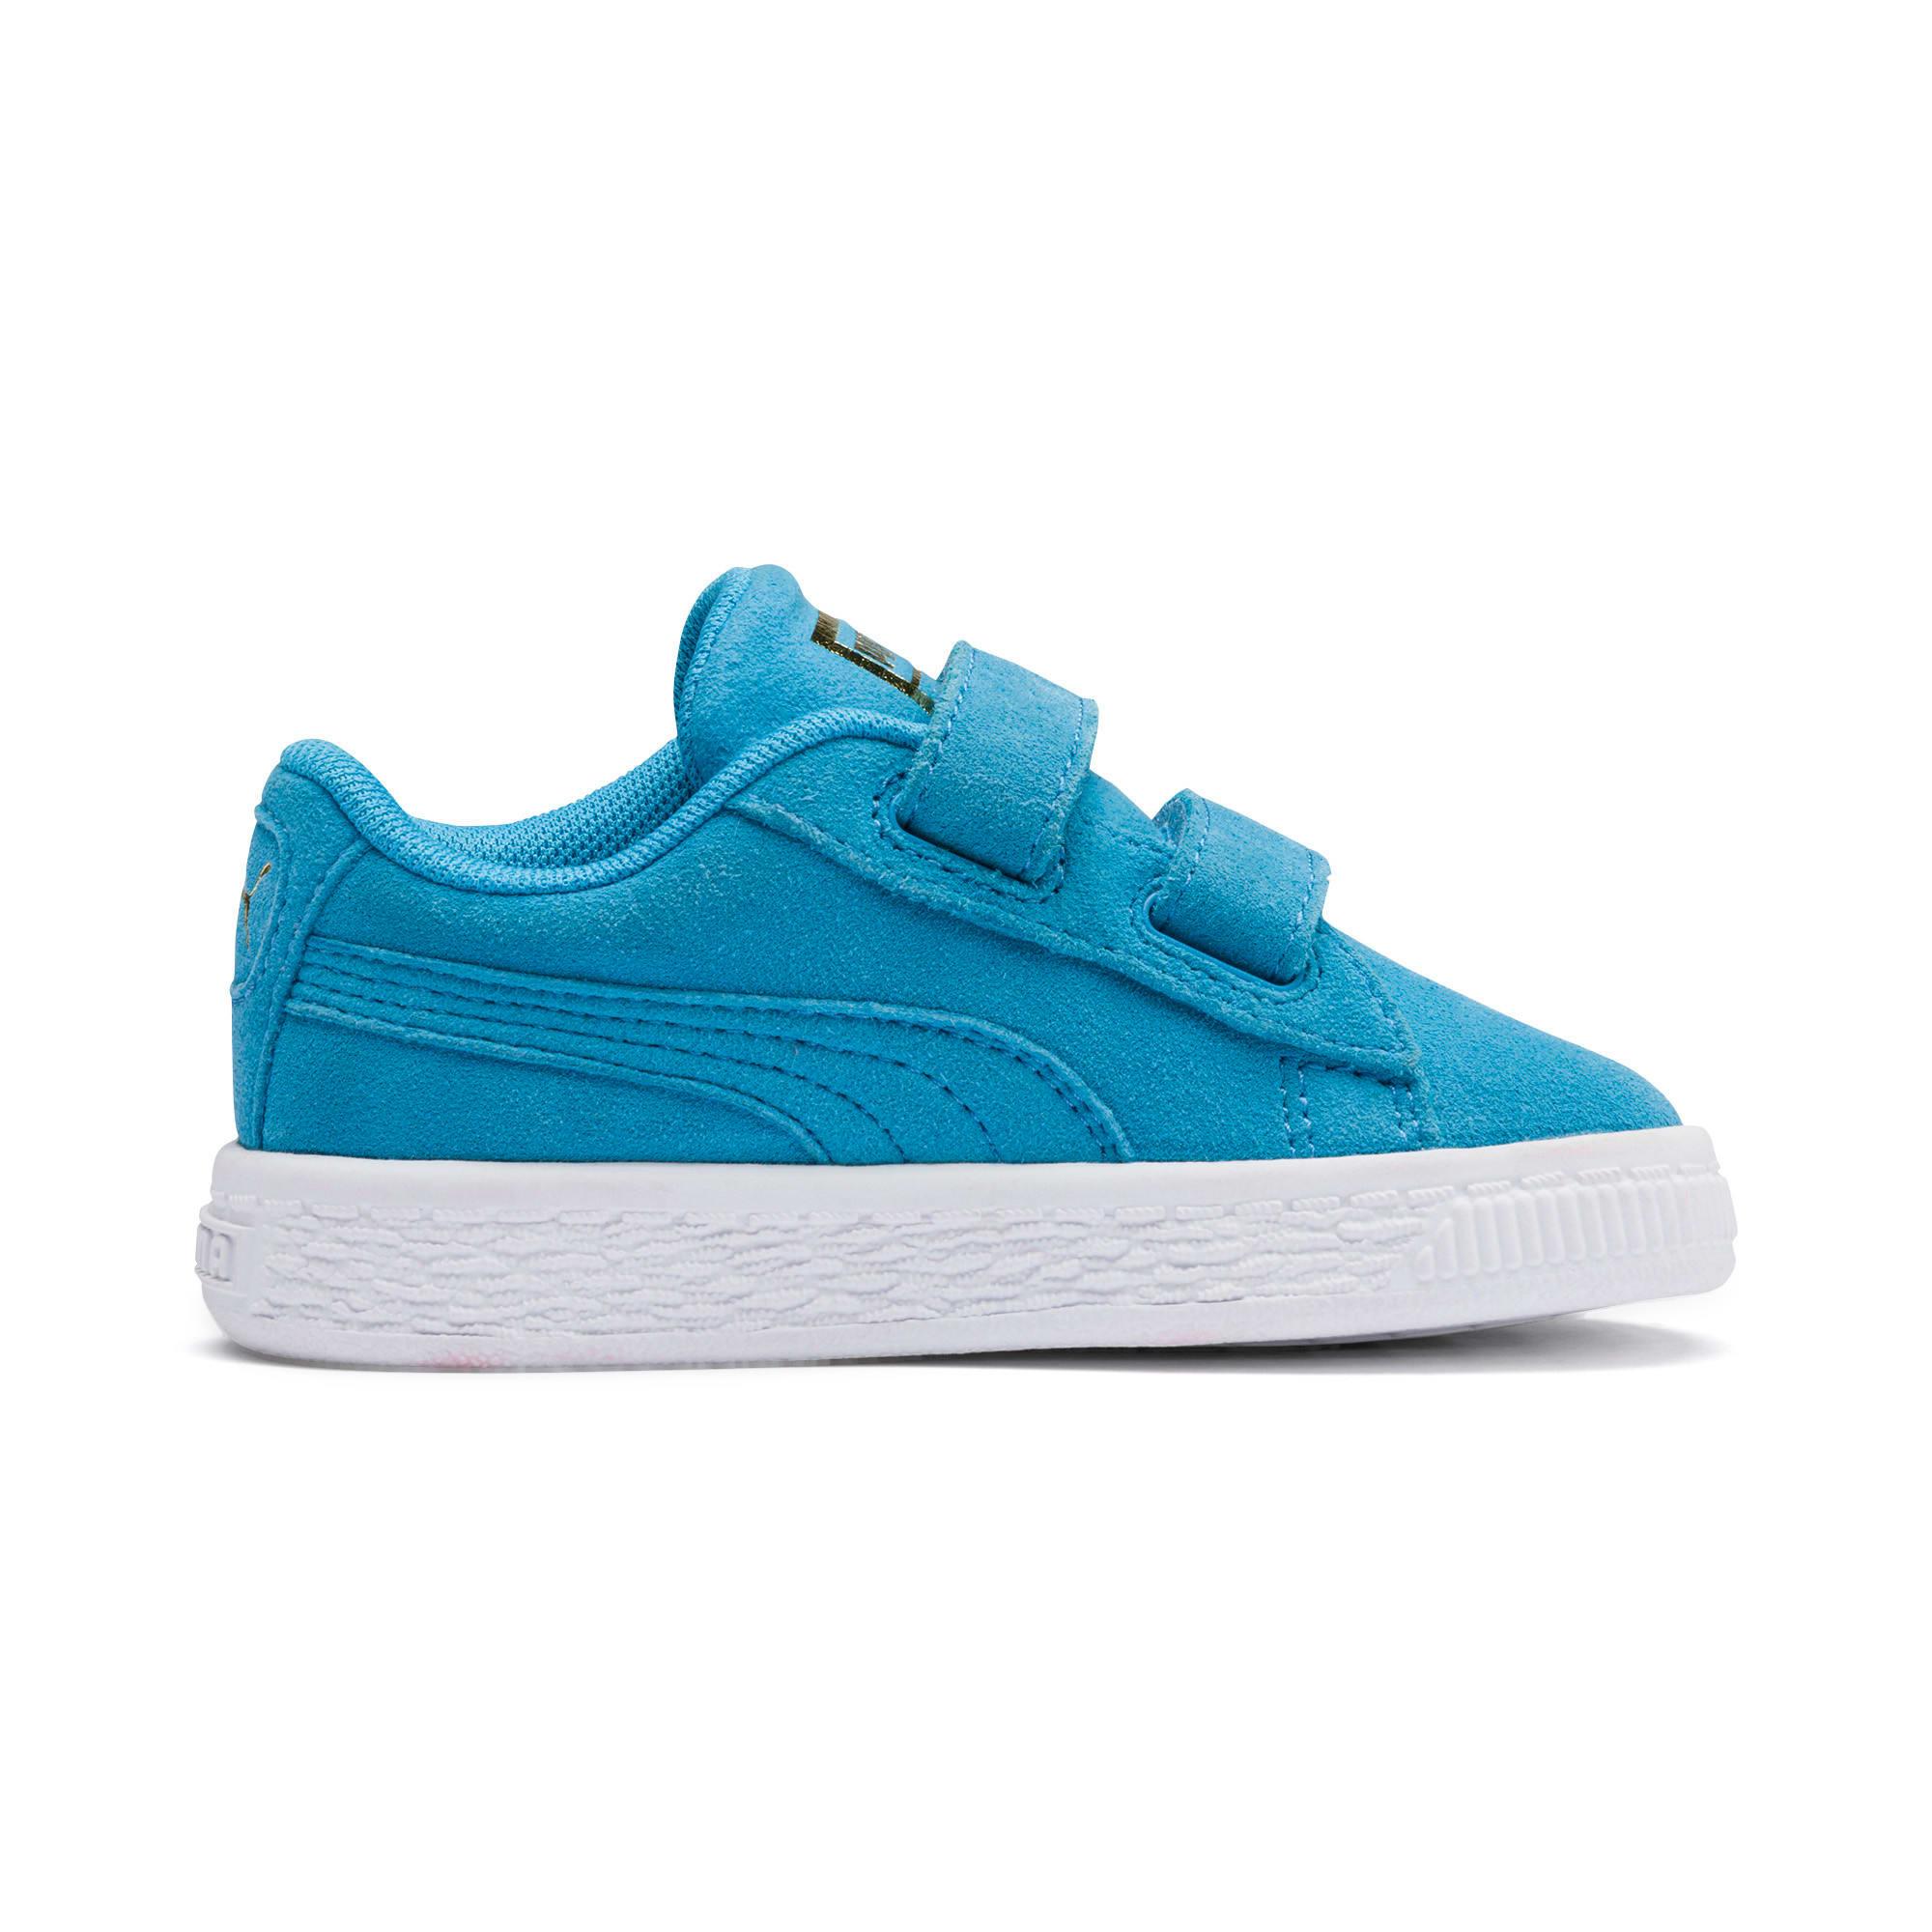 Thumbnail 5 of PUMA x SESAME STREET 50 Suede Statement Toddler Shoes, Bleu Azur-Puma White, medium